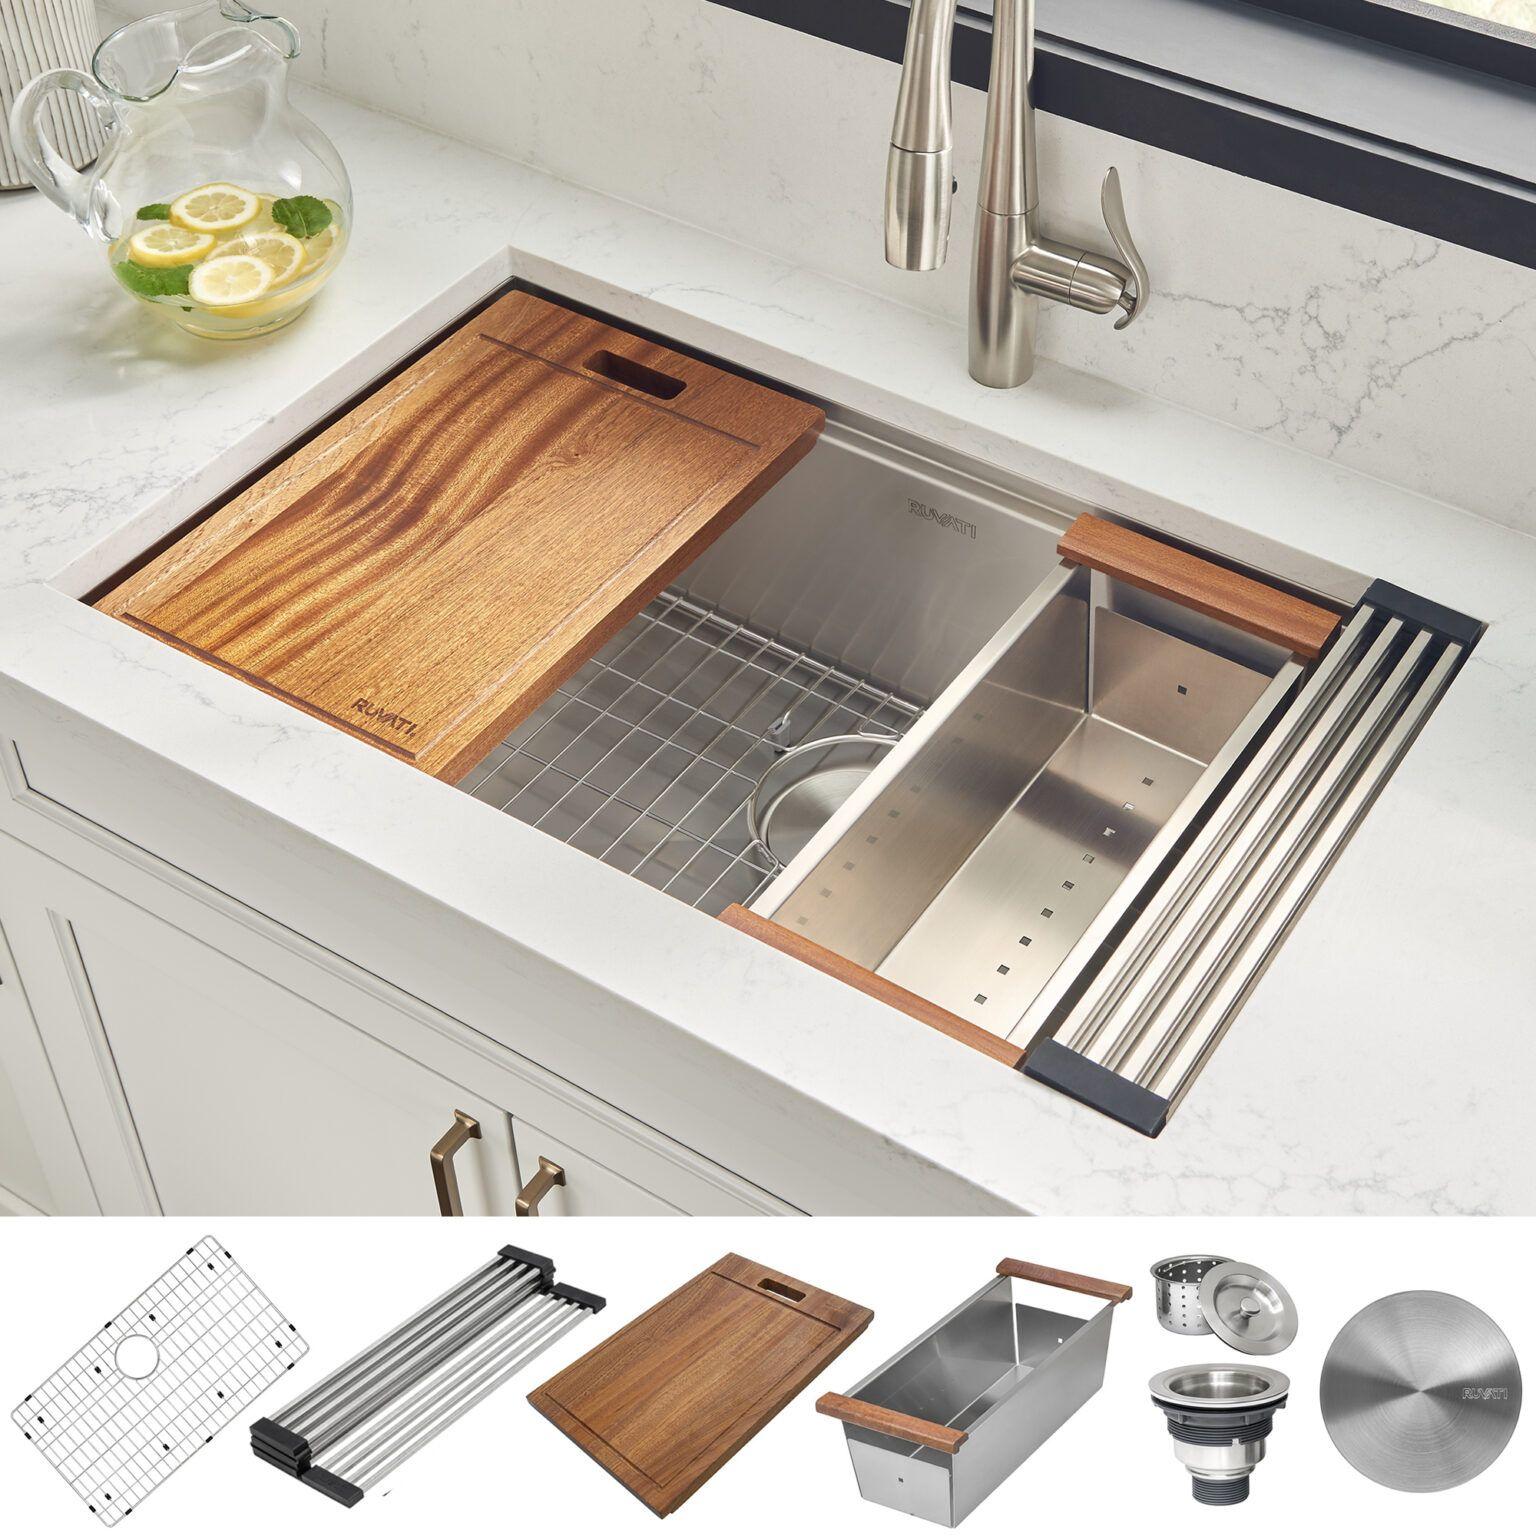 28 Inch Workstation Ledge Undermount 16 Gauge Stainless Steel Kitchen Sink Single Bowl Ruvati Usa Stainless Steel Kitchen Sink Stainless Steel Ledge Ledge Kitchen Sinks